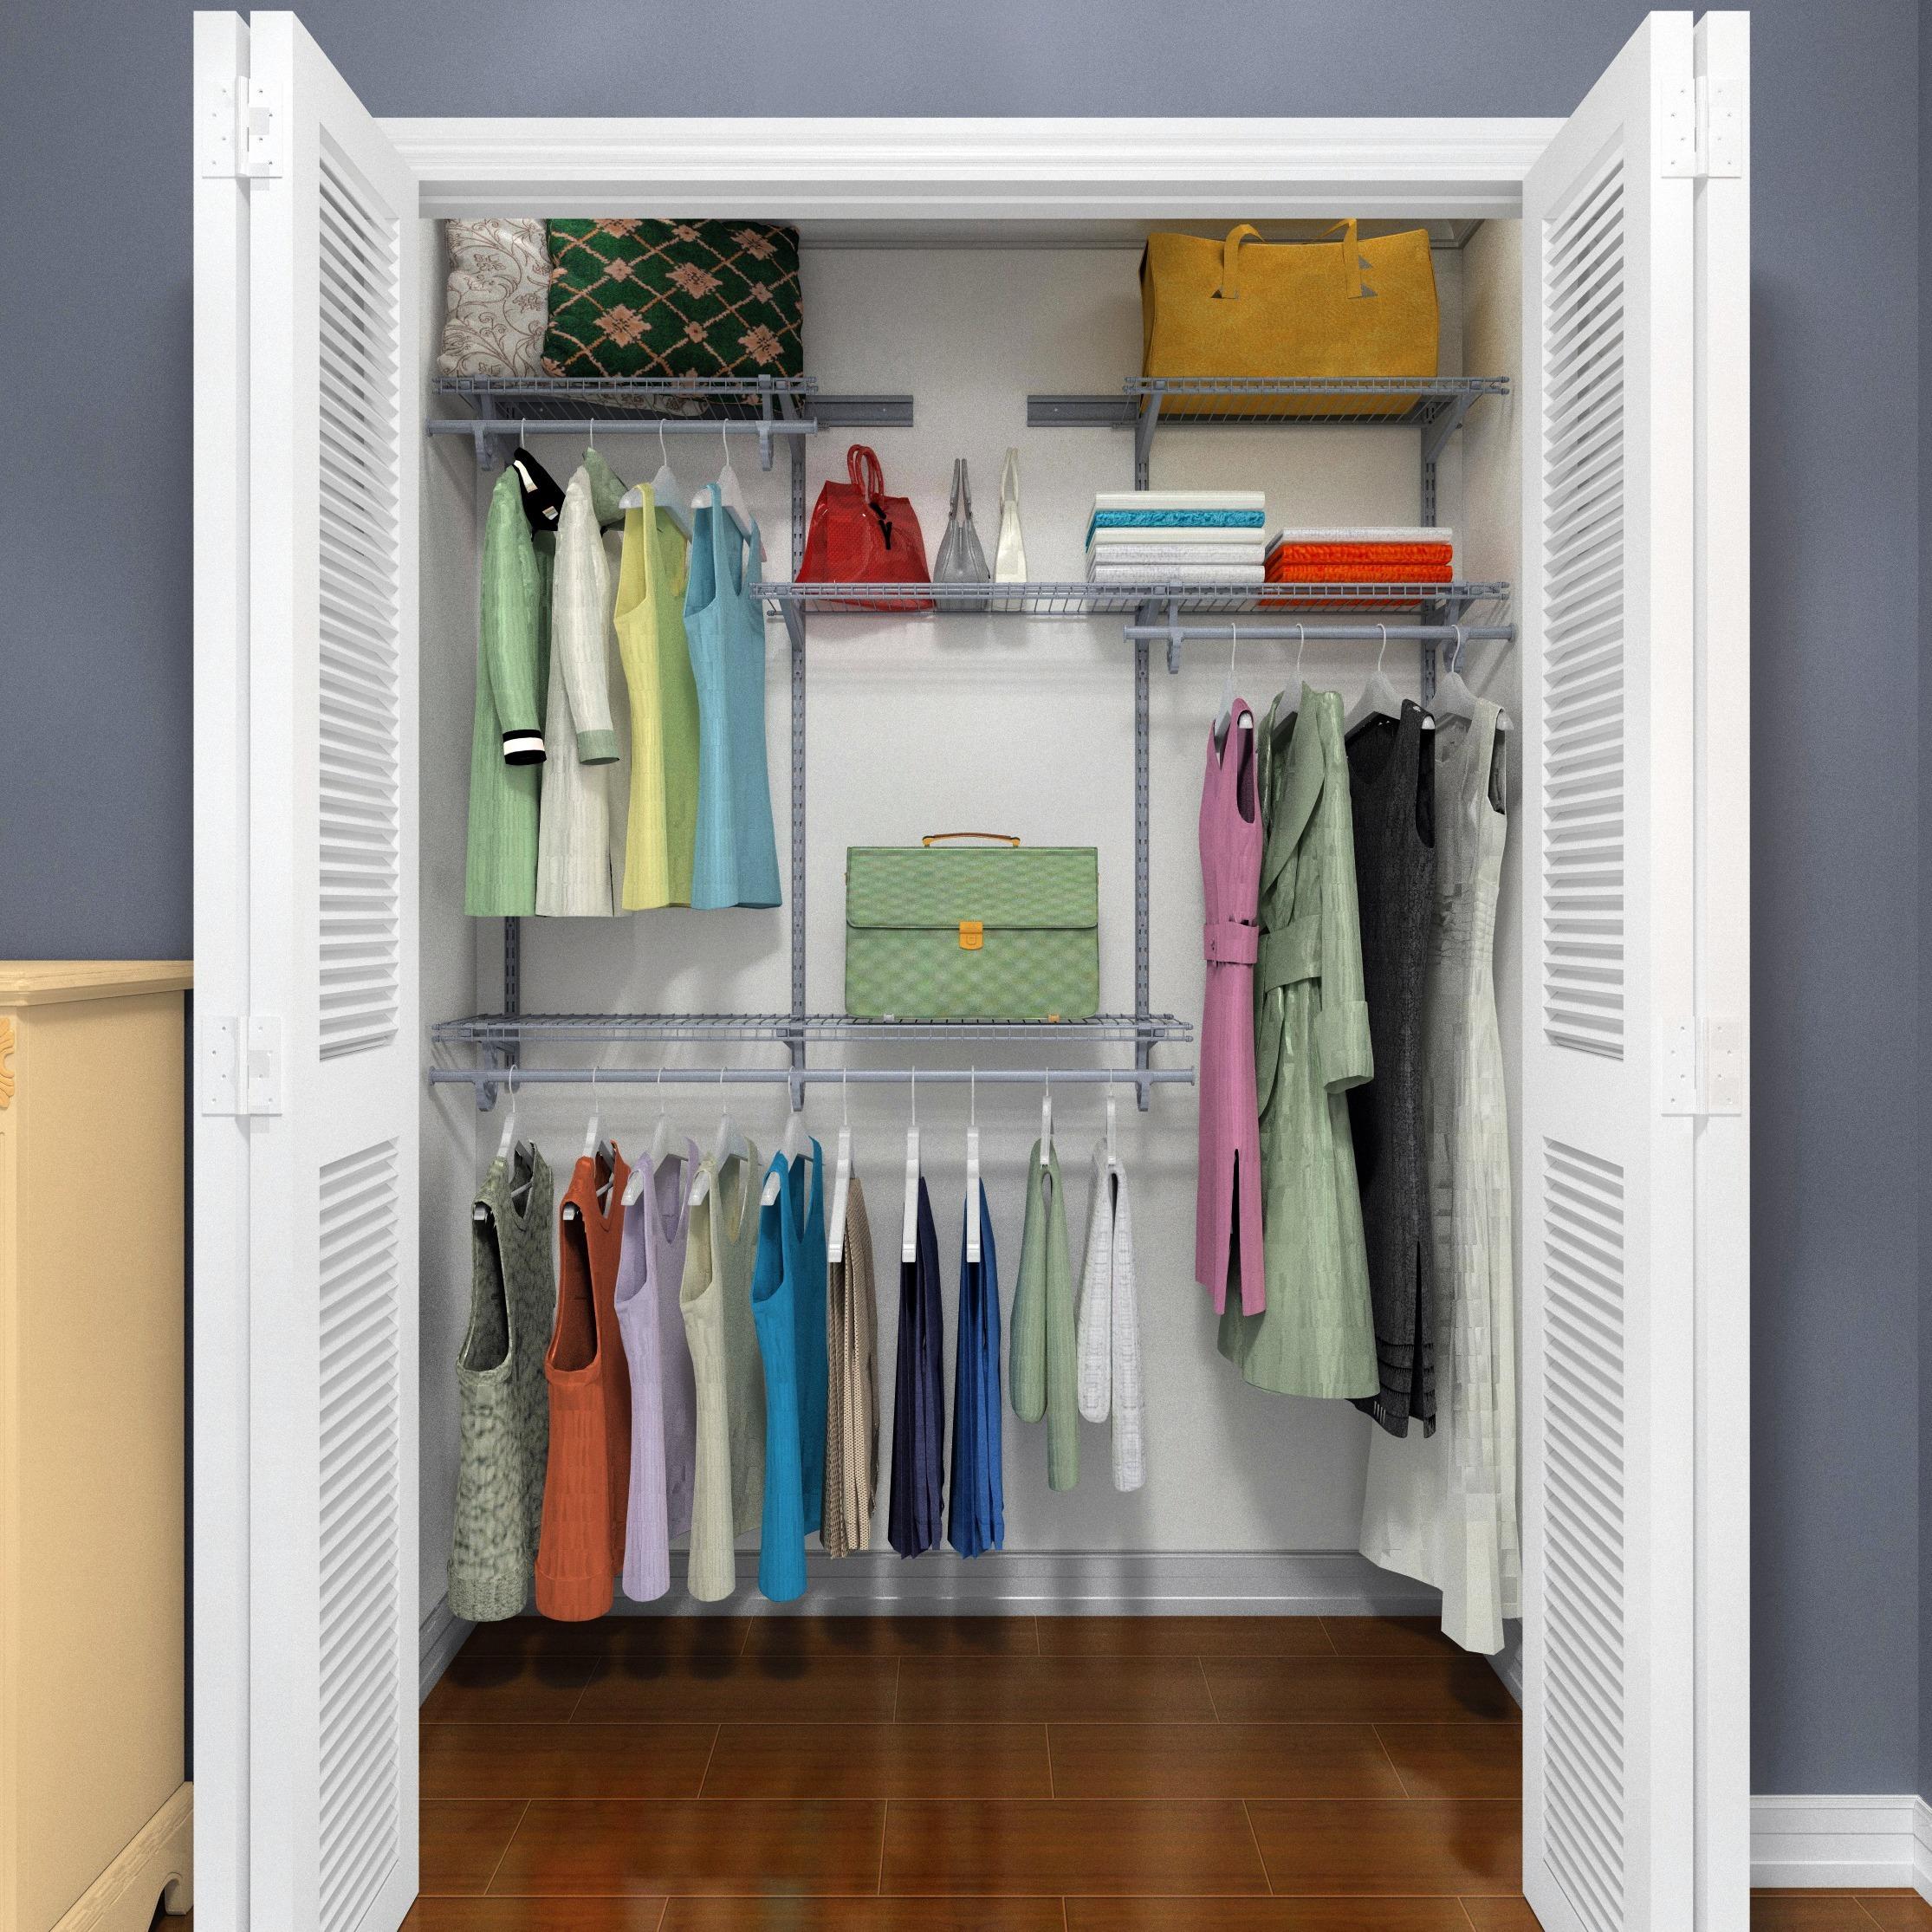 Closetmaid Shelftrack 4ft To 6ft Closet Organizer Kit Satin Chrome